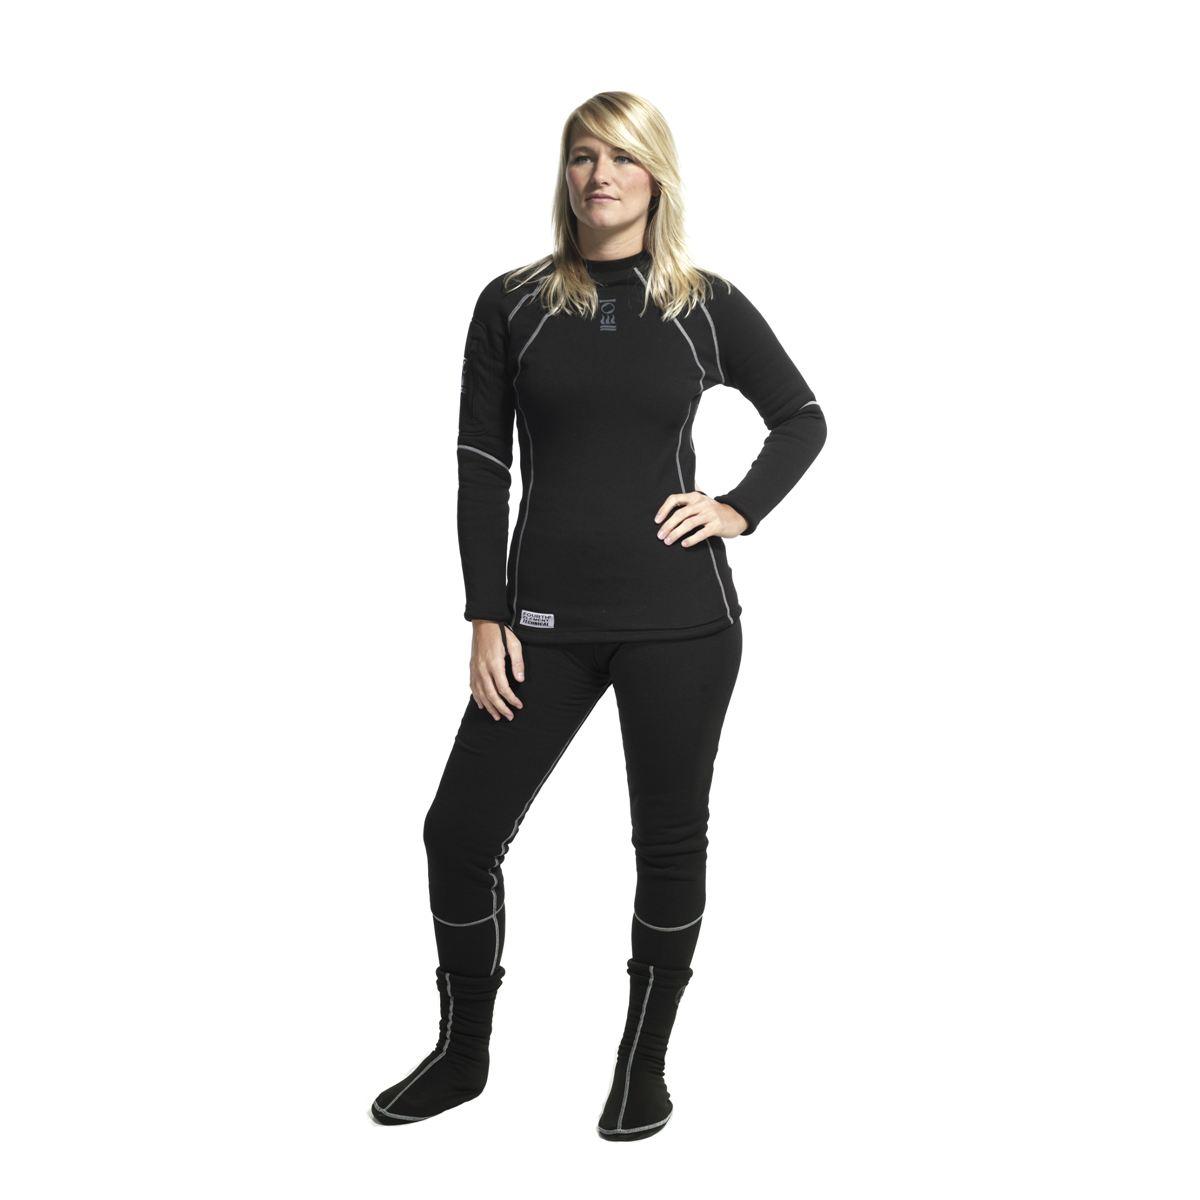 Дамско термобельо за сух водолазен костюм ARCTIC Two - Fourth Element